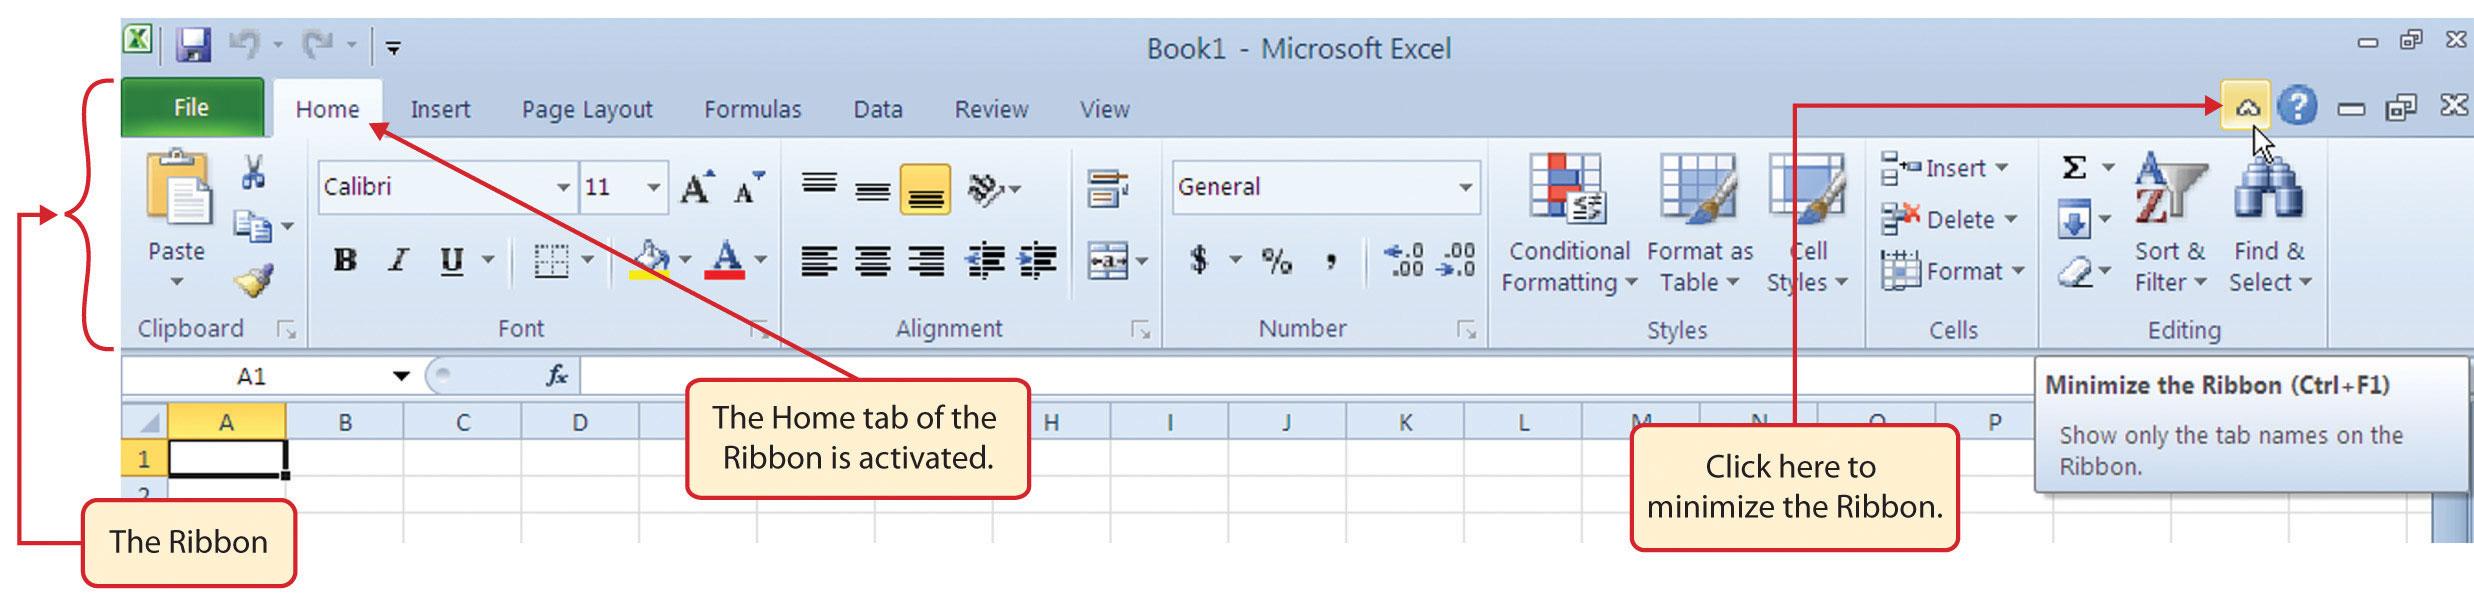 Microsoft Home Use Program Customer Service Number